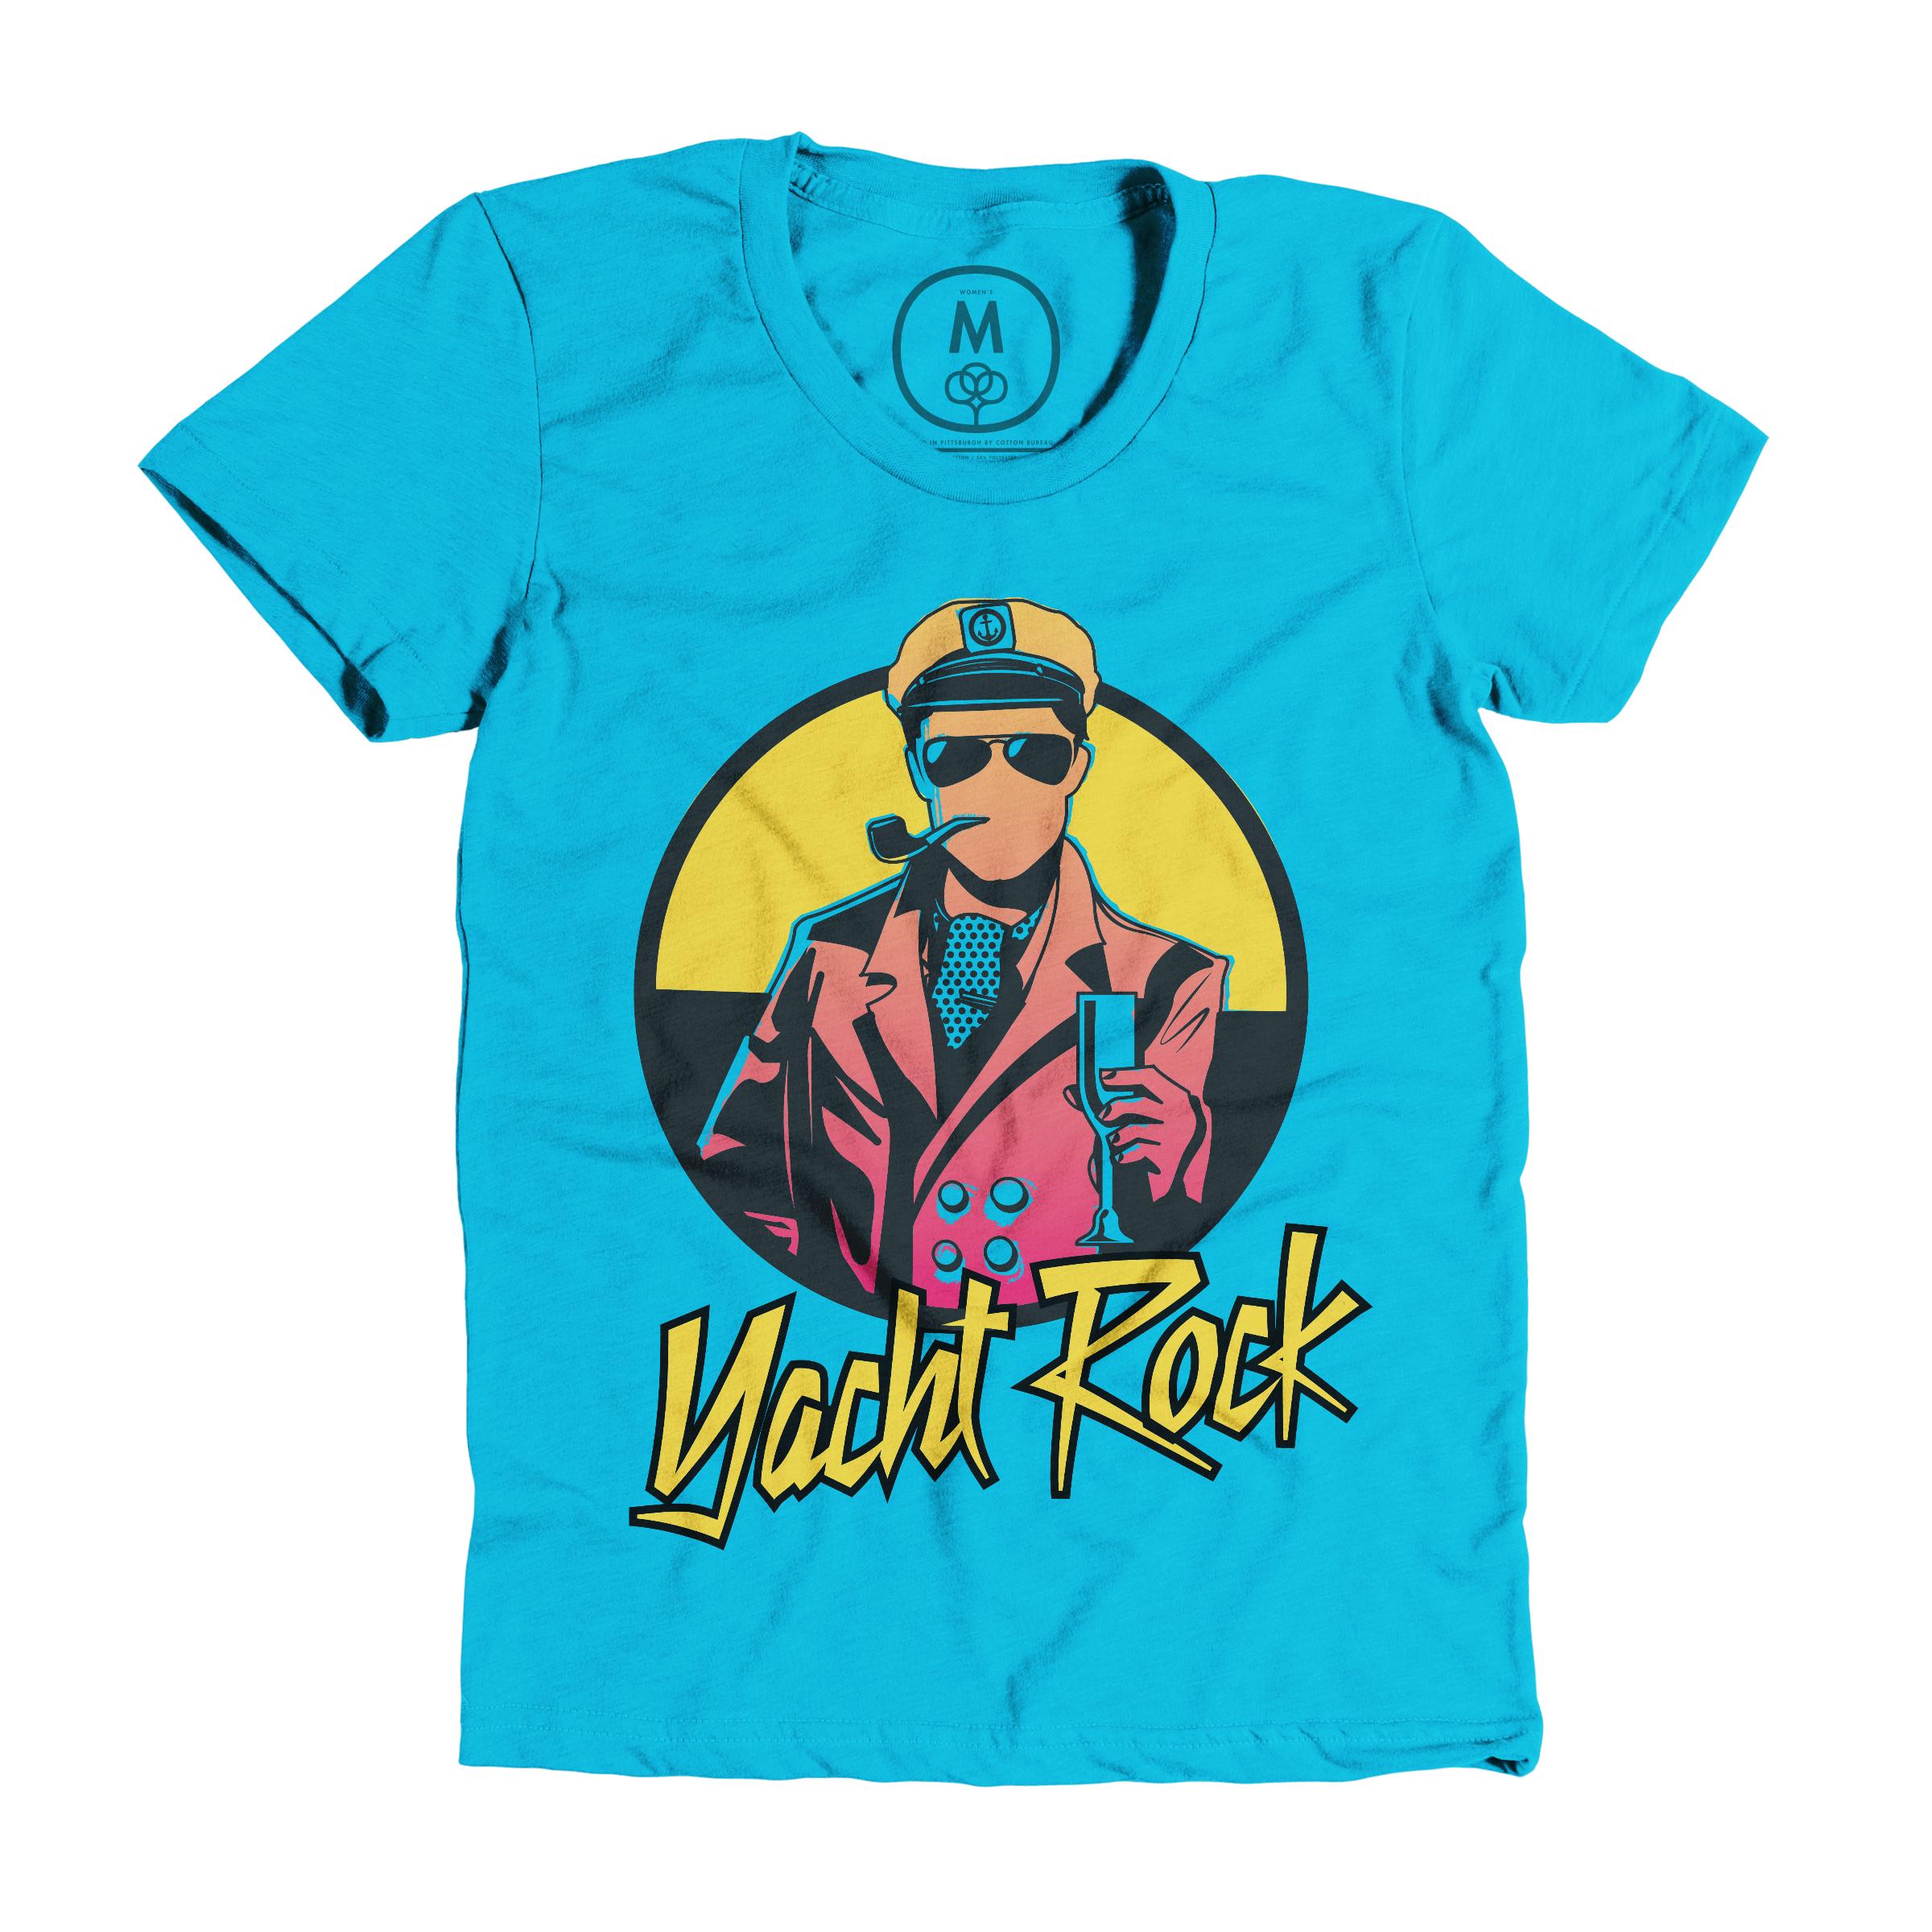 Yacht Rock Turquoise (Women's)